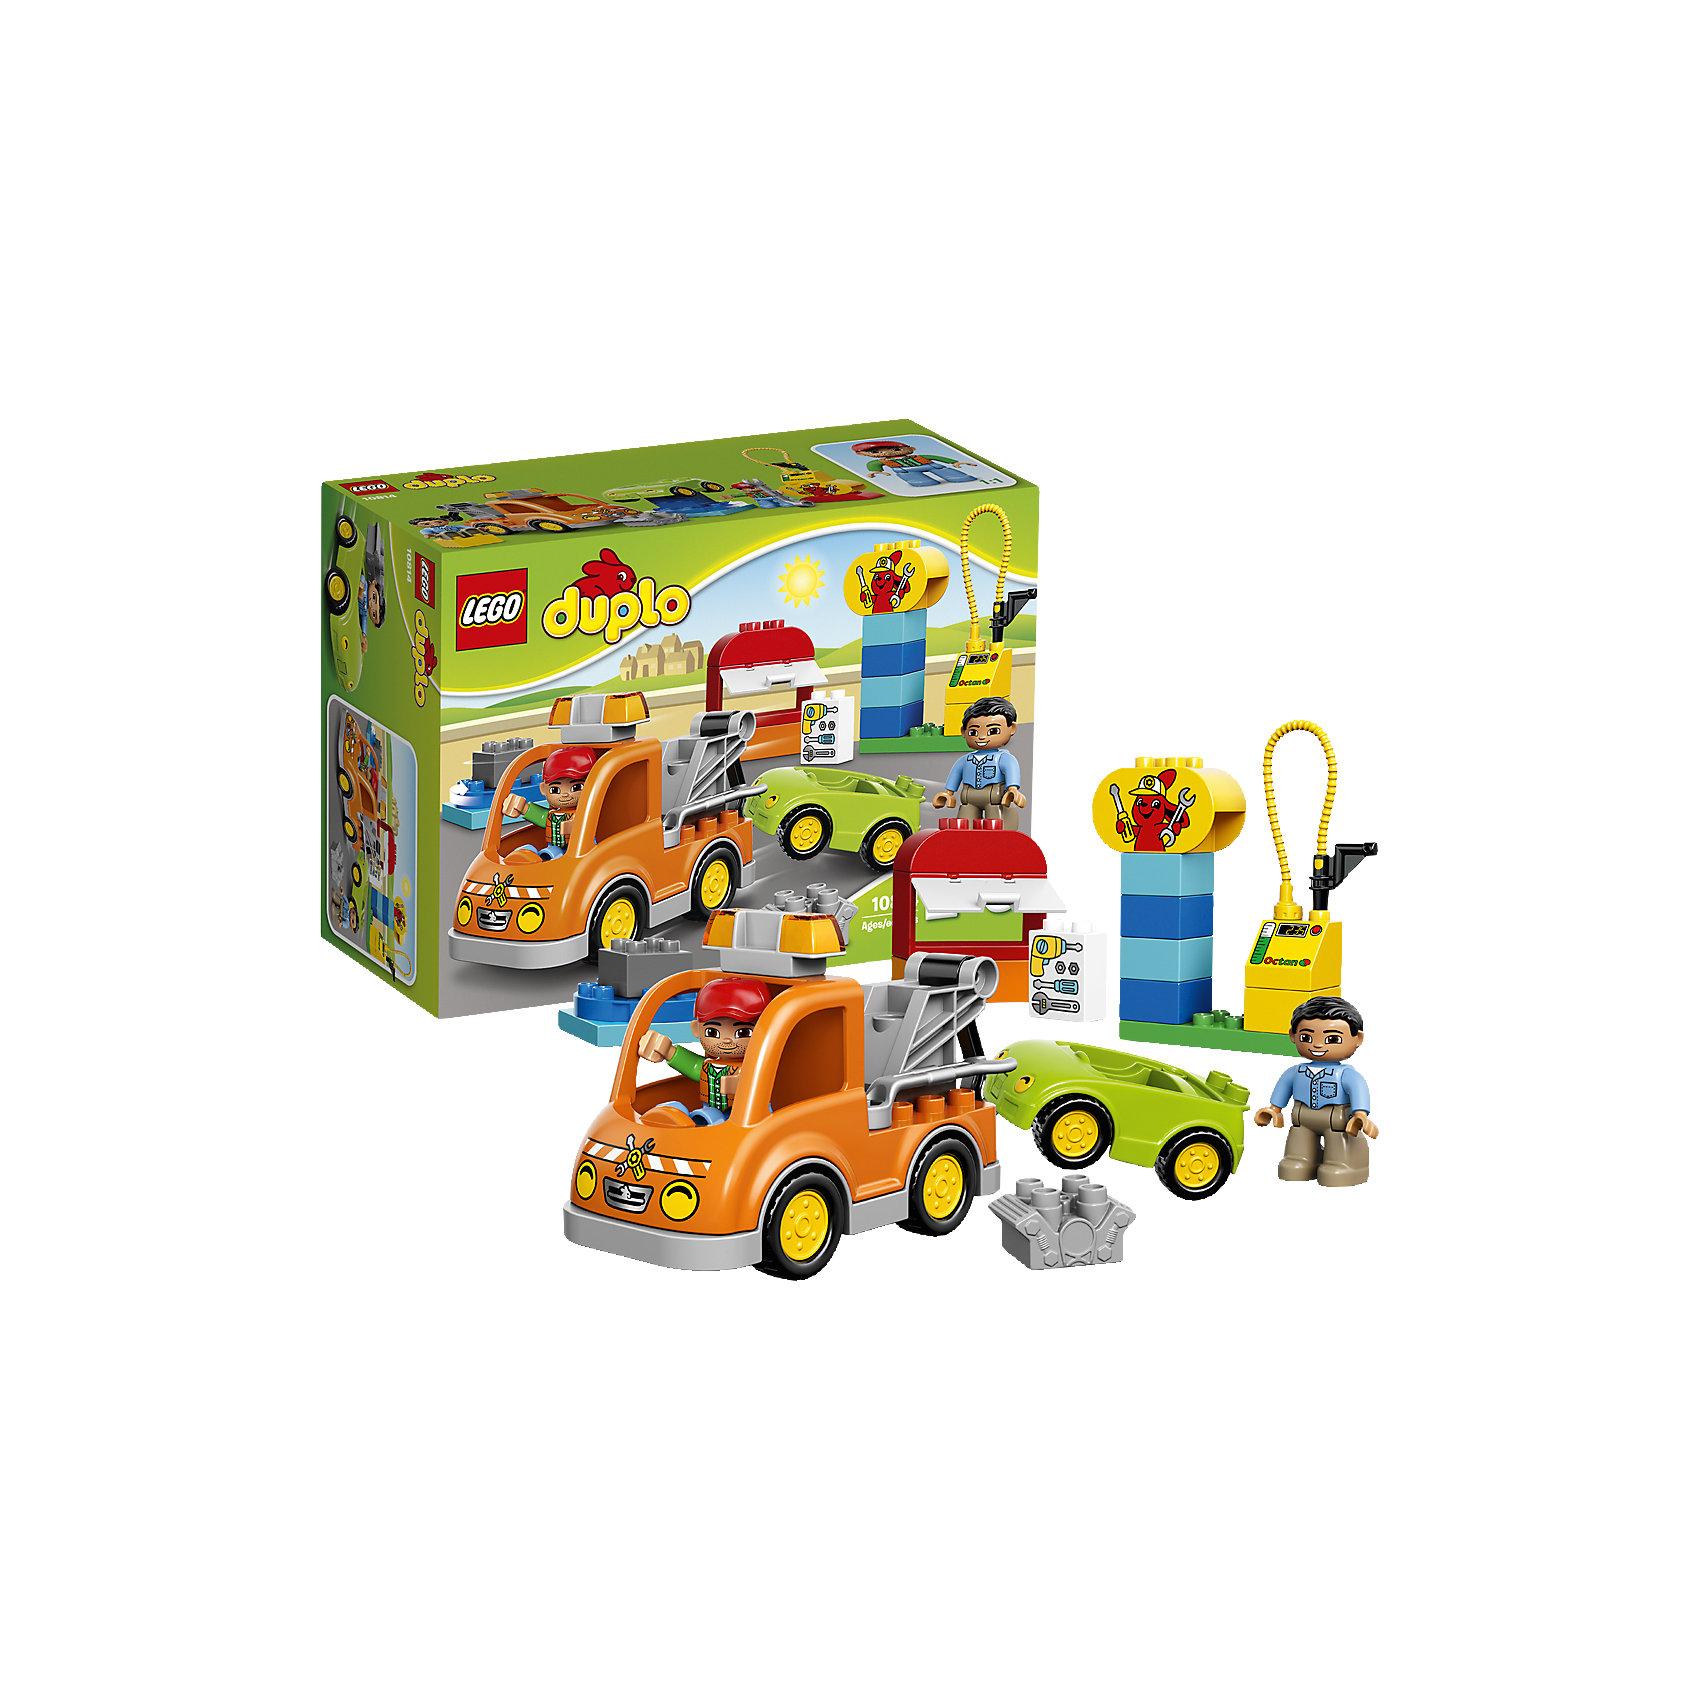 LEGO DUPLO 10814: Буксировщик